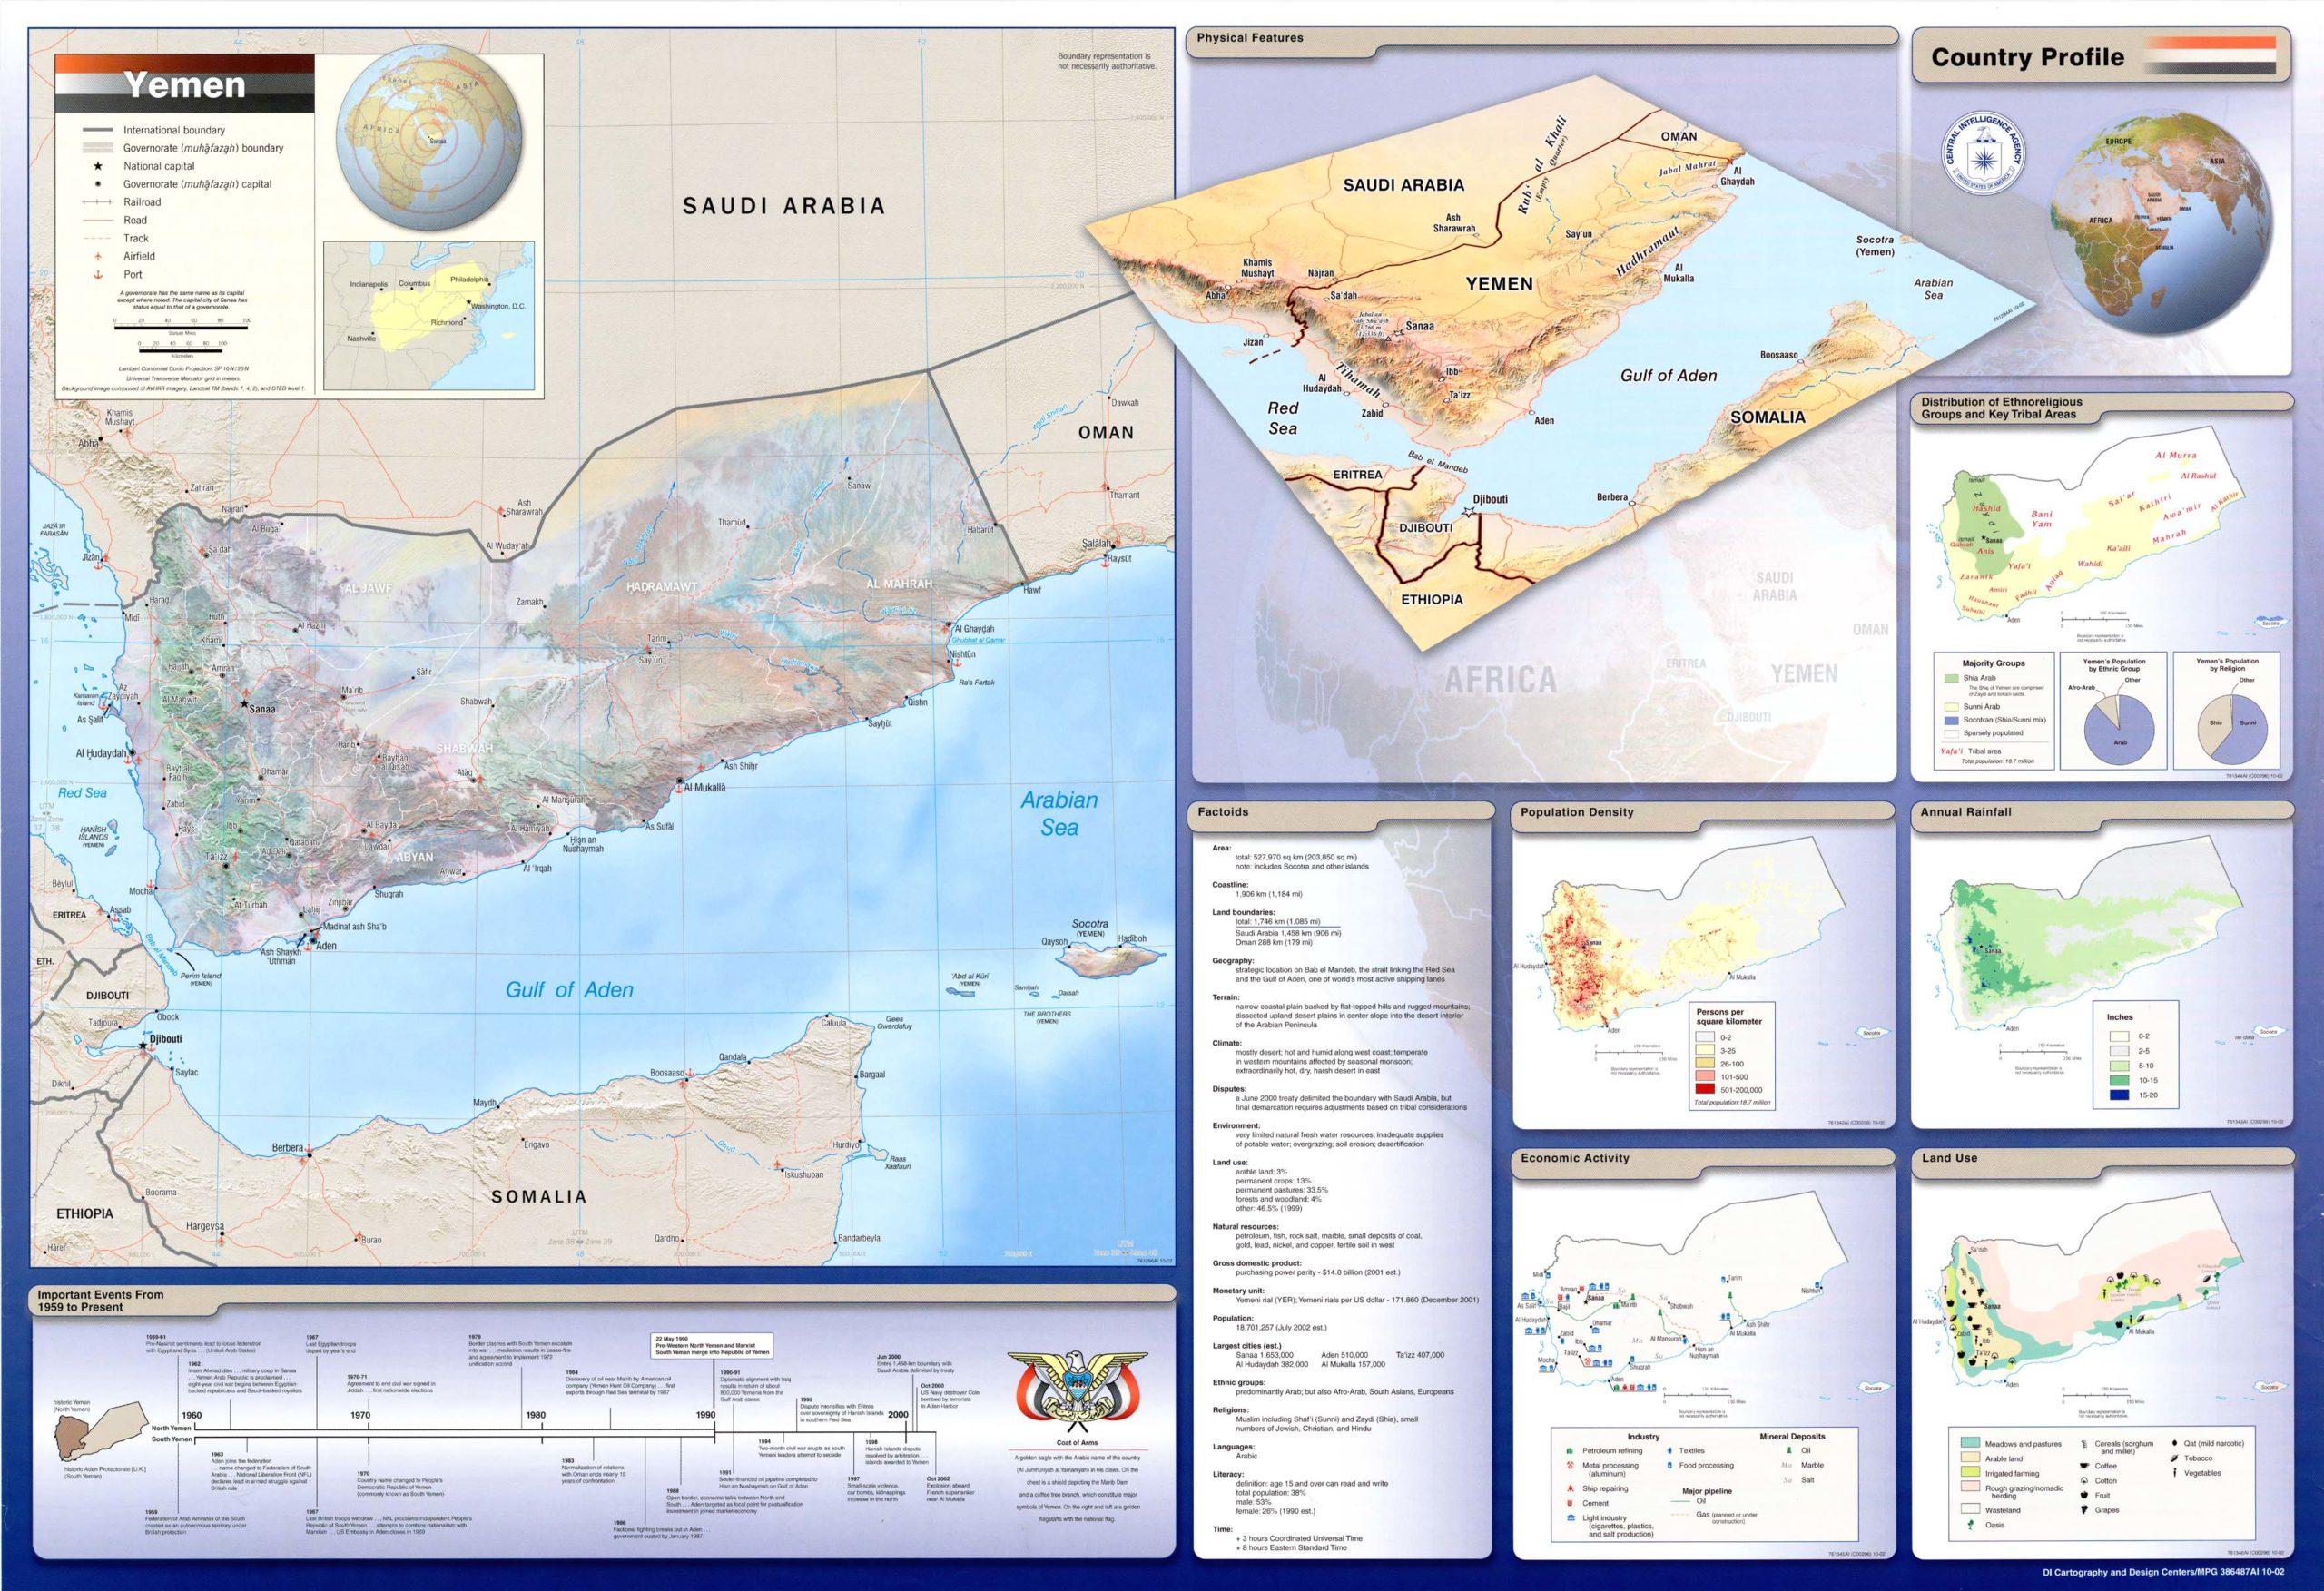 Ficha de Yemen. CIA, 2002